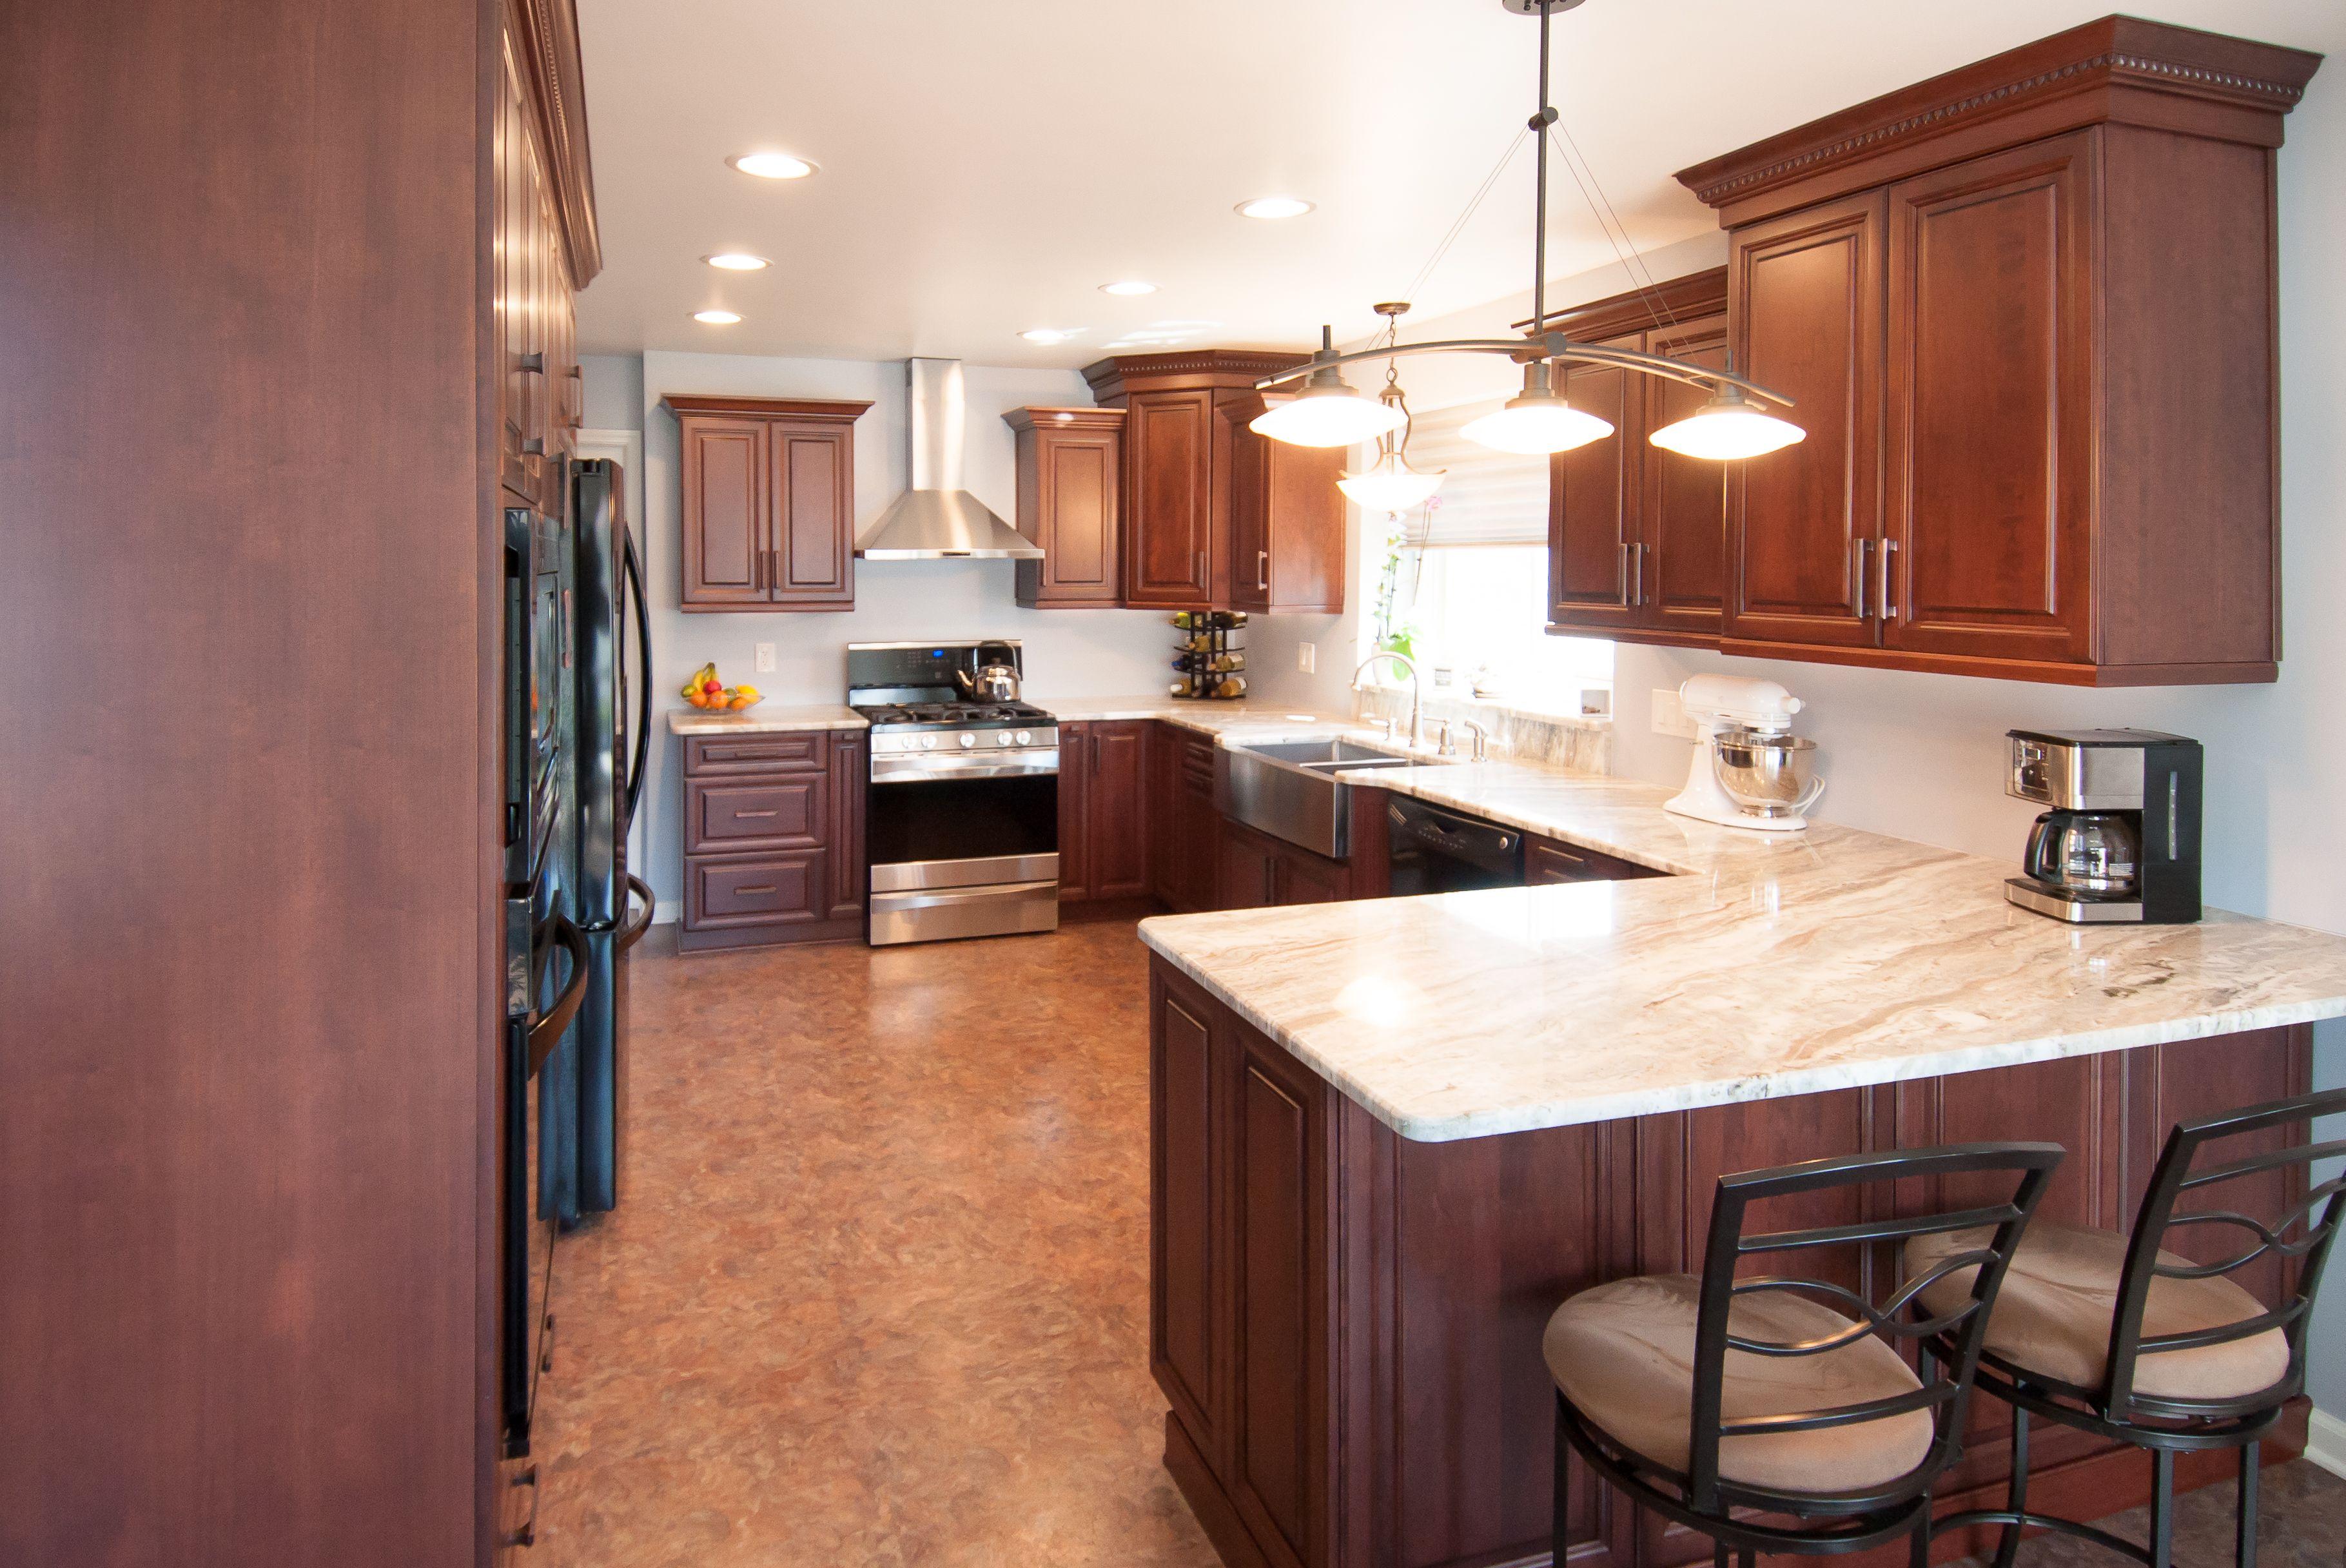 A Newly Remodeled Lafata Kitchen Custom Cabinets Kitchen Cabinets Kitchen